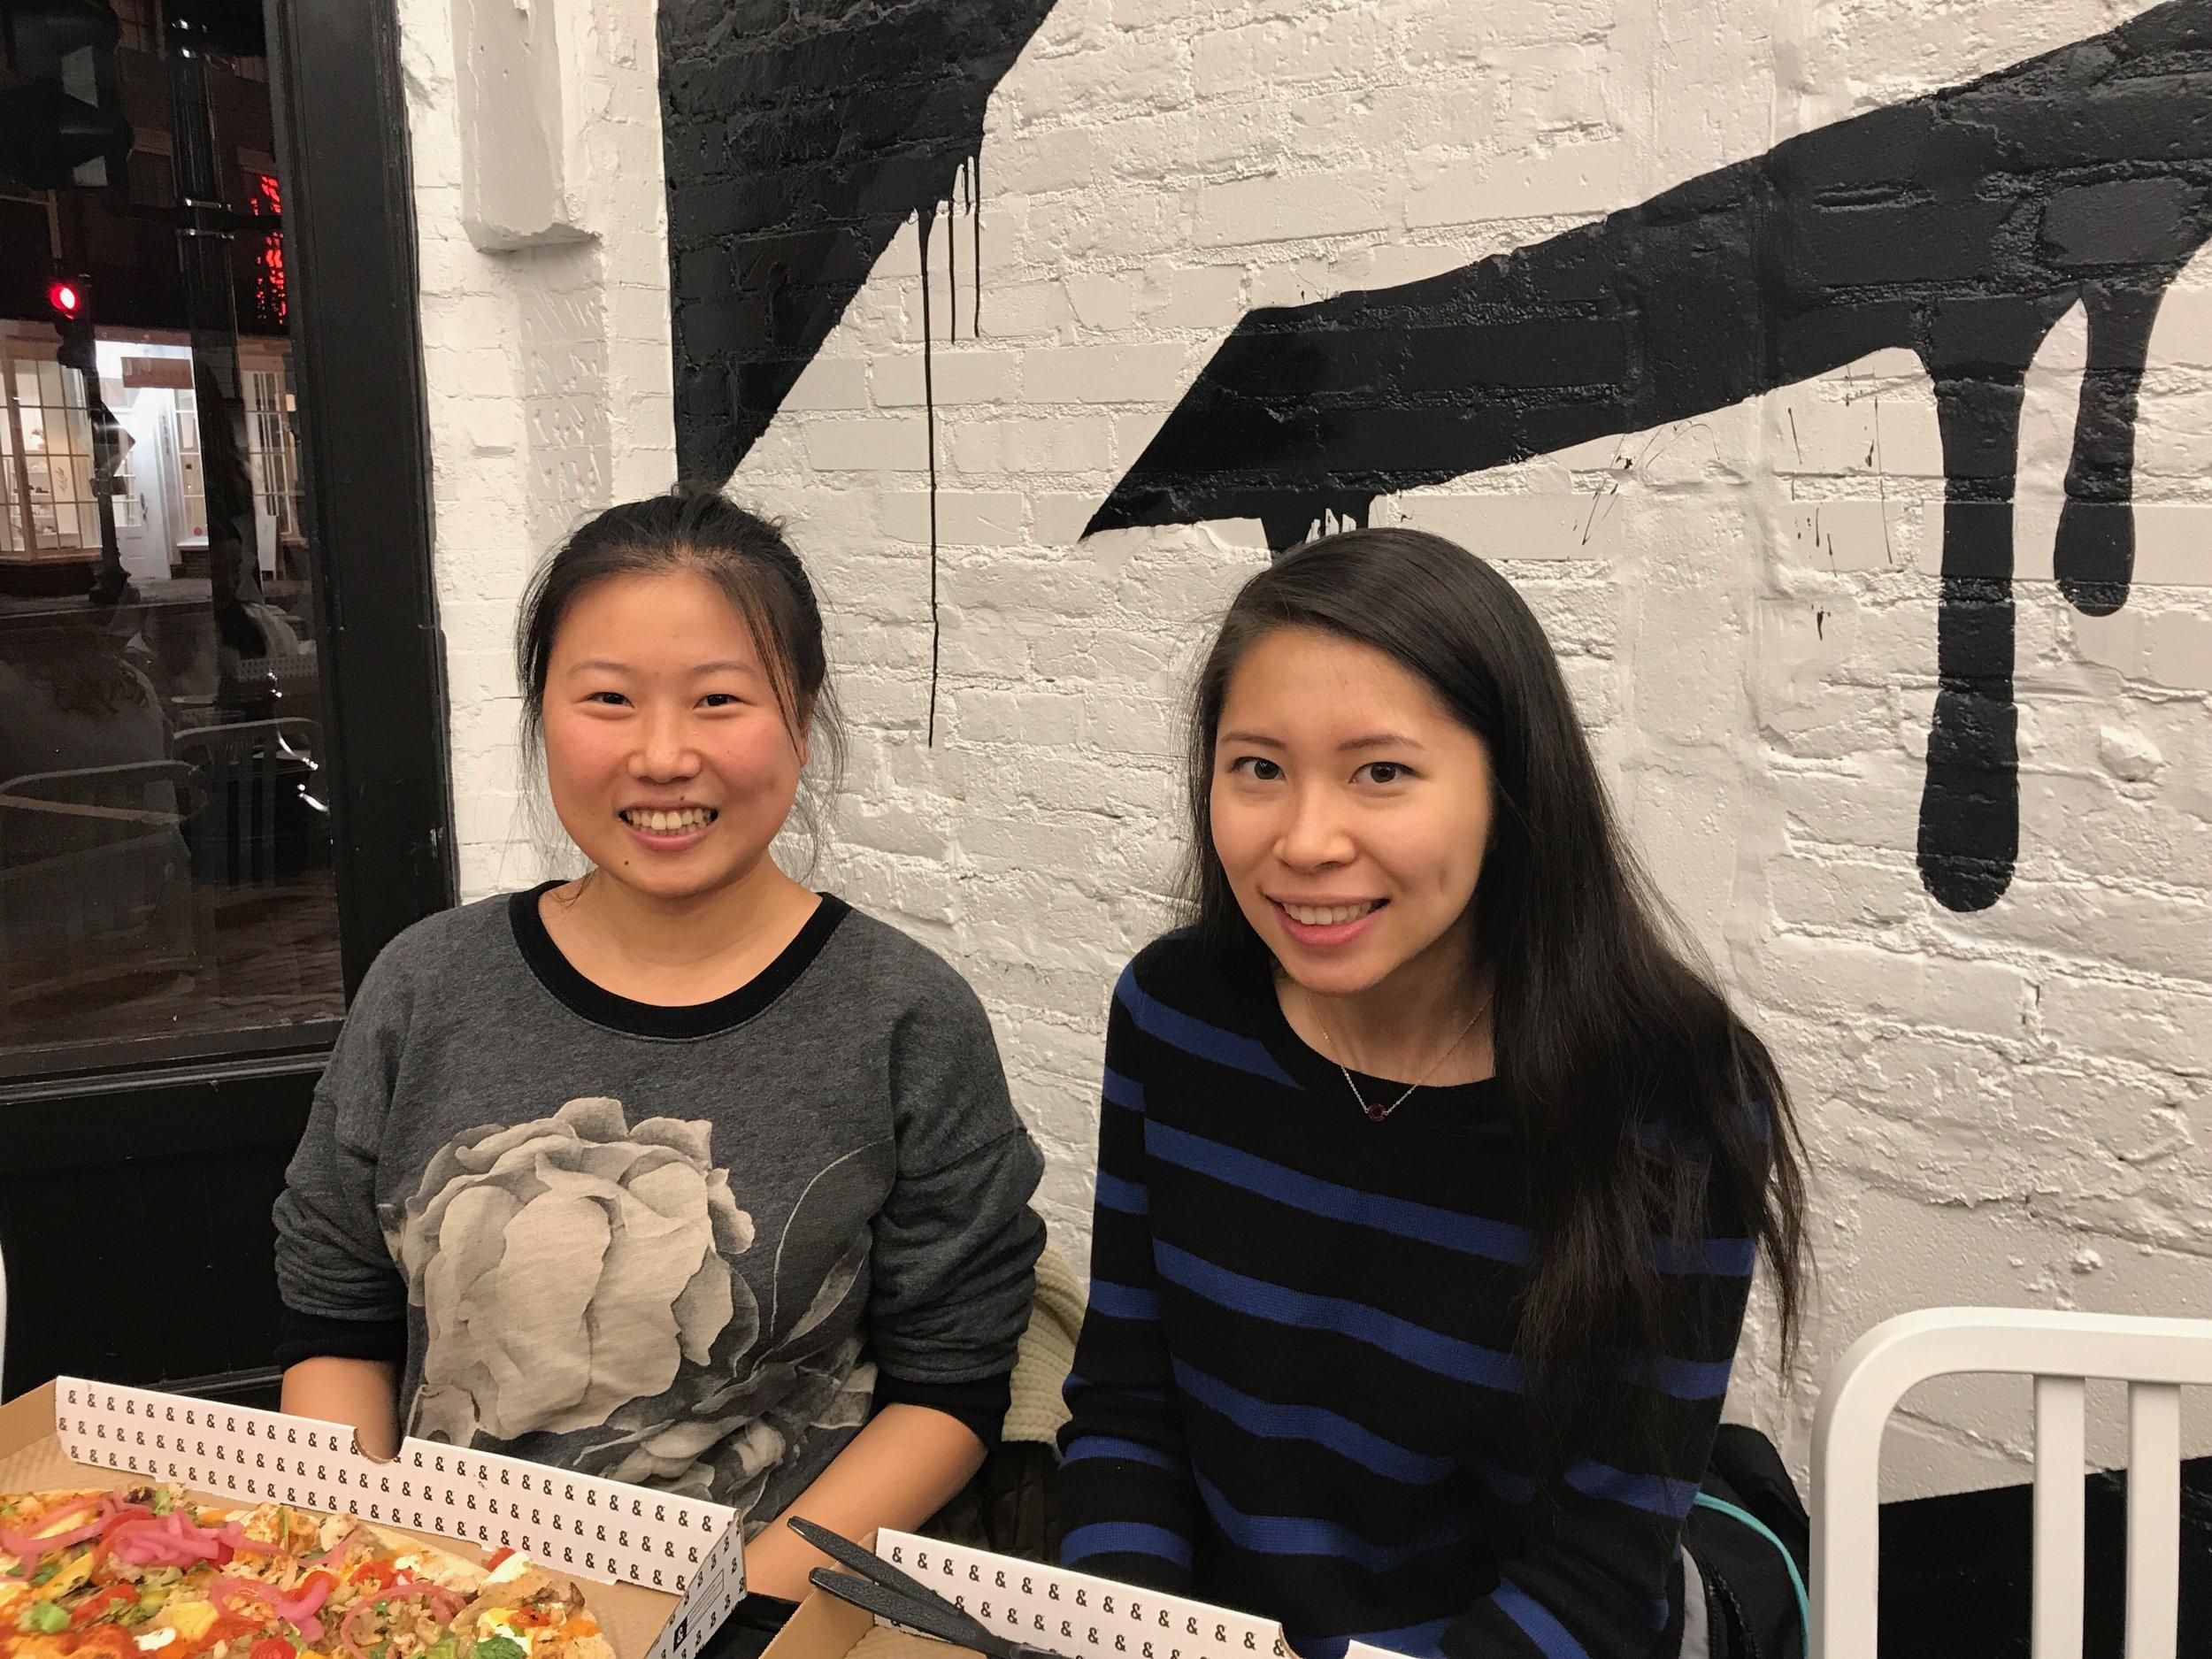 November 8: &pizza Fundraiser